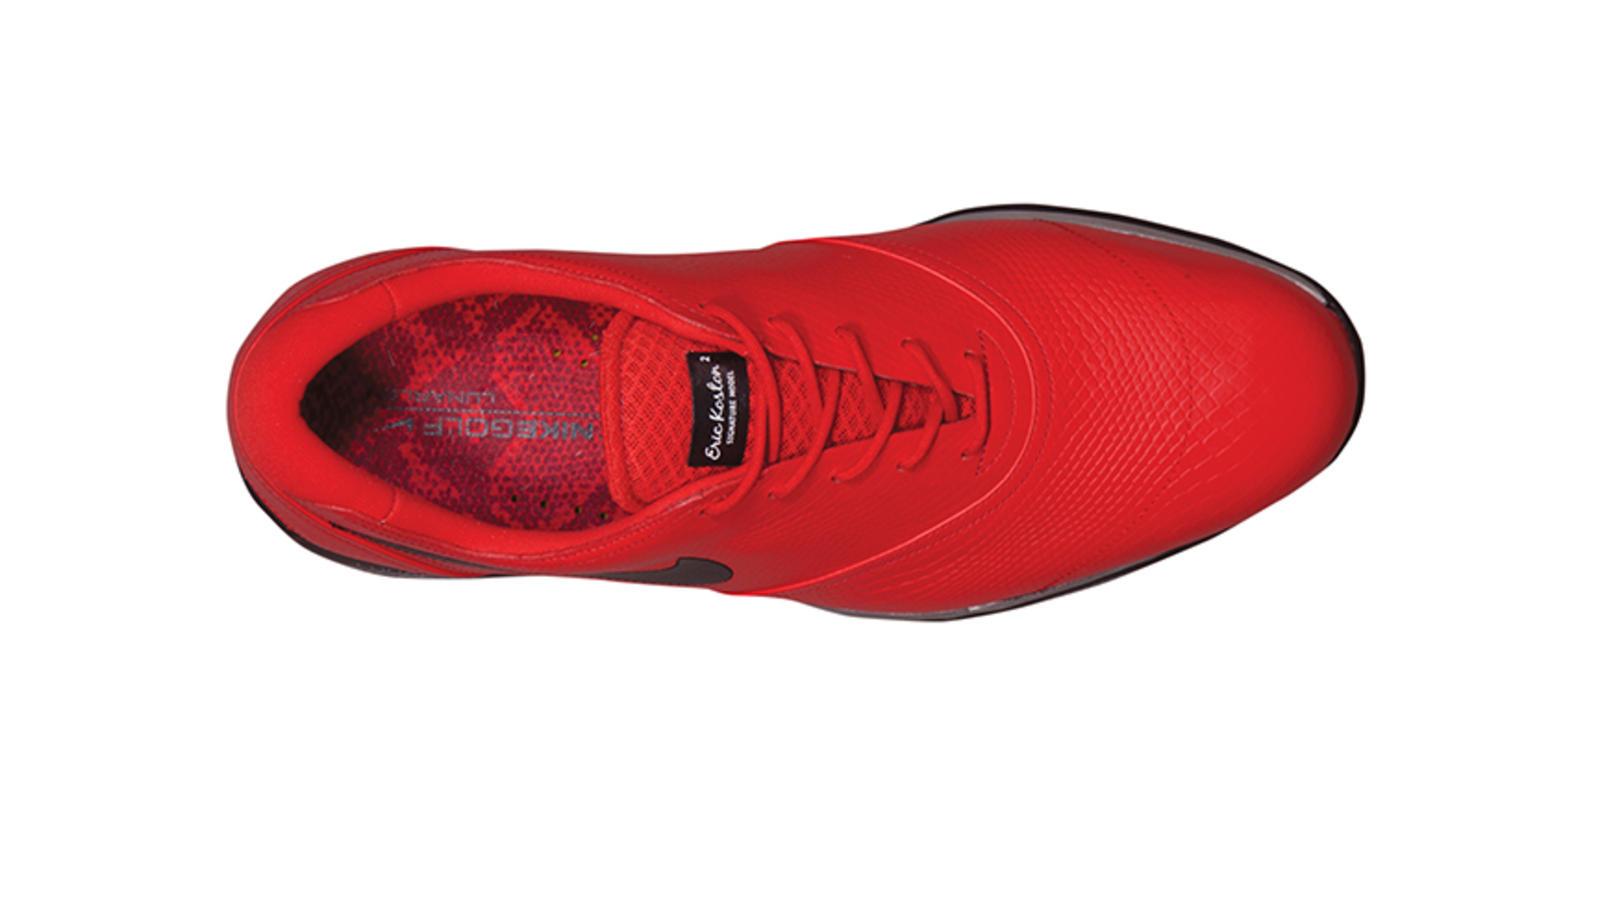 Nike Koston 2 IT: Tee Time Will Never